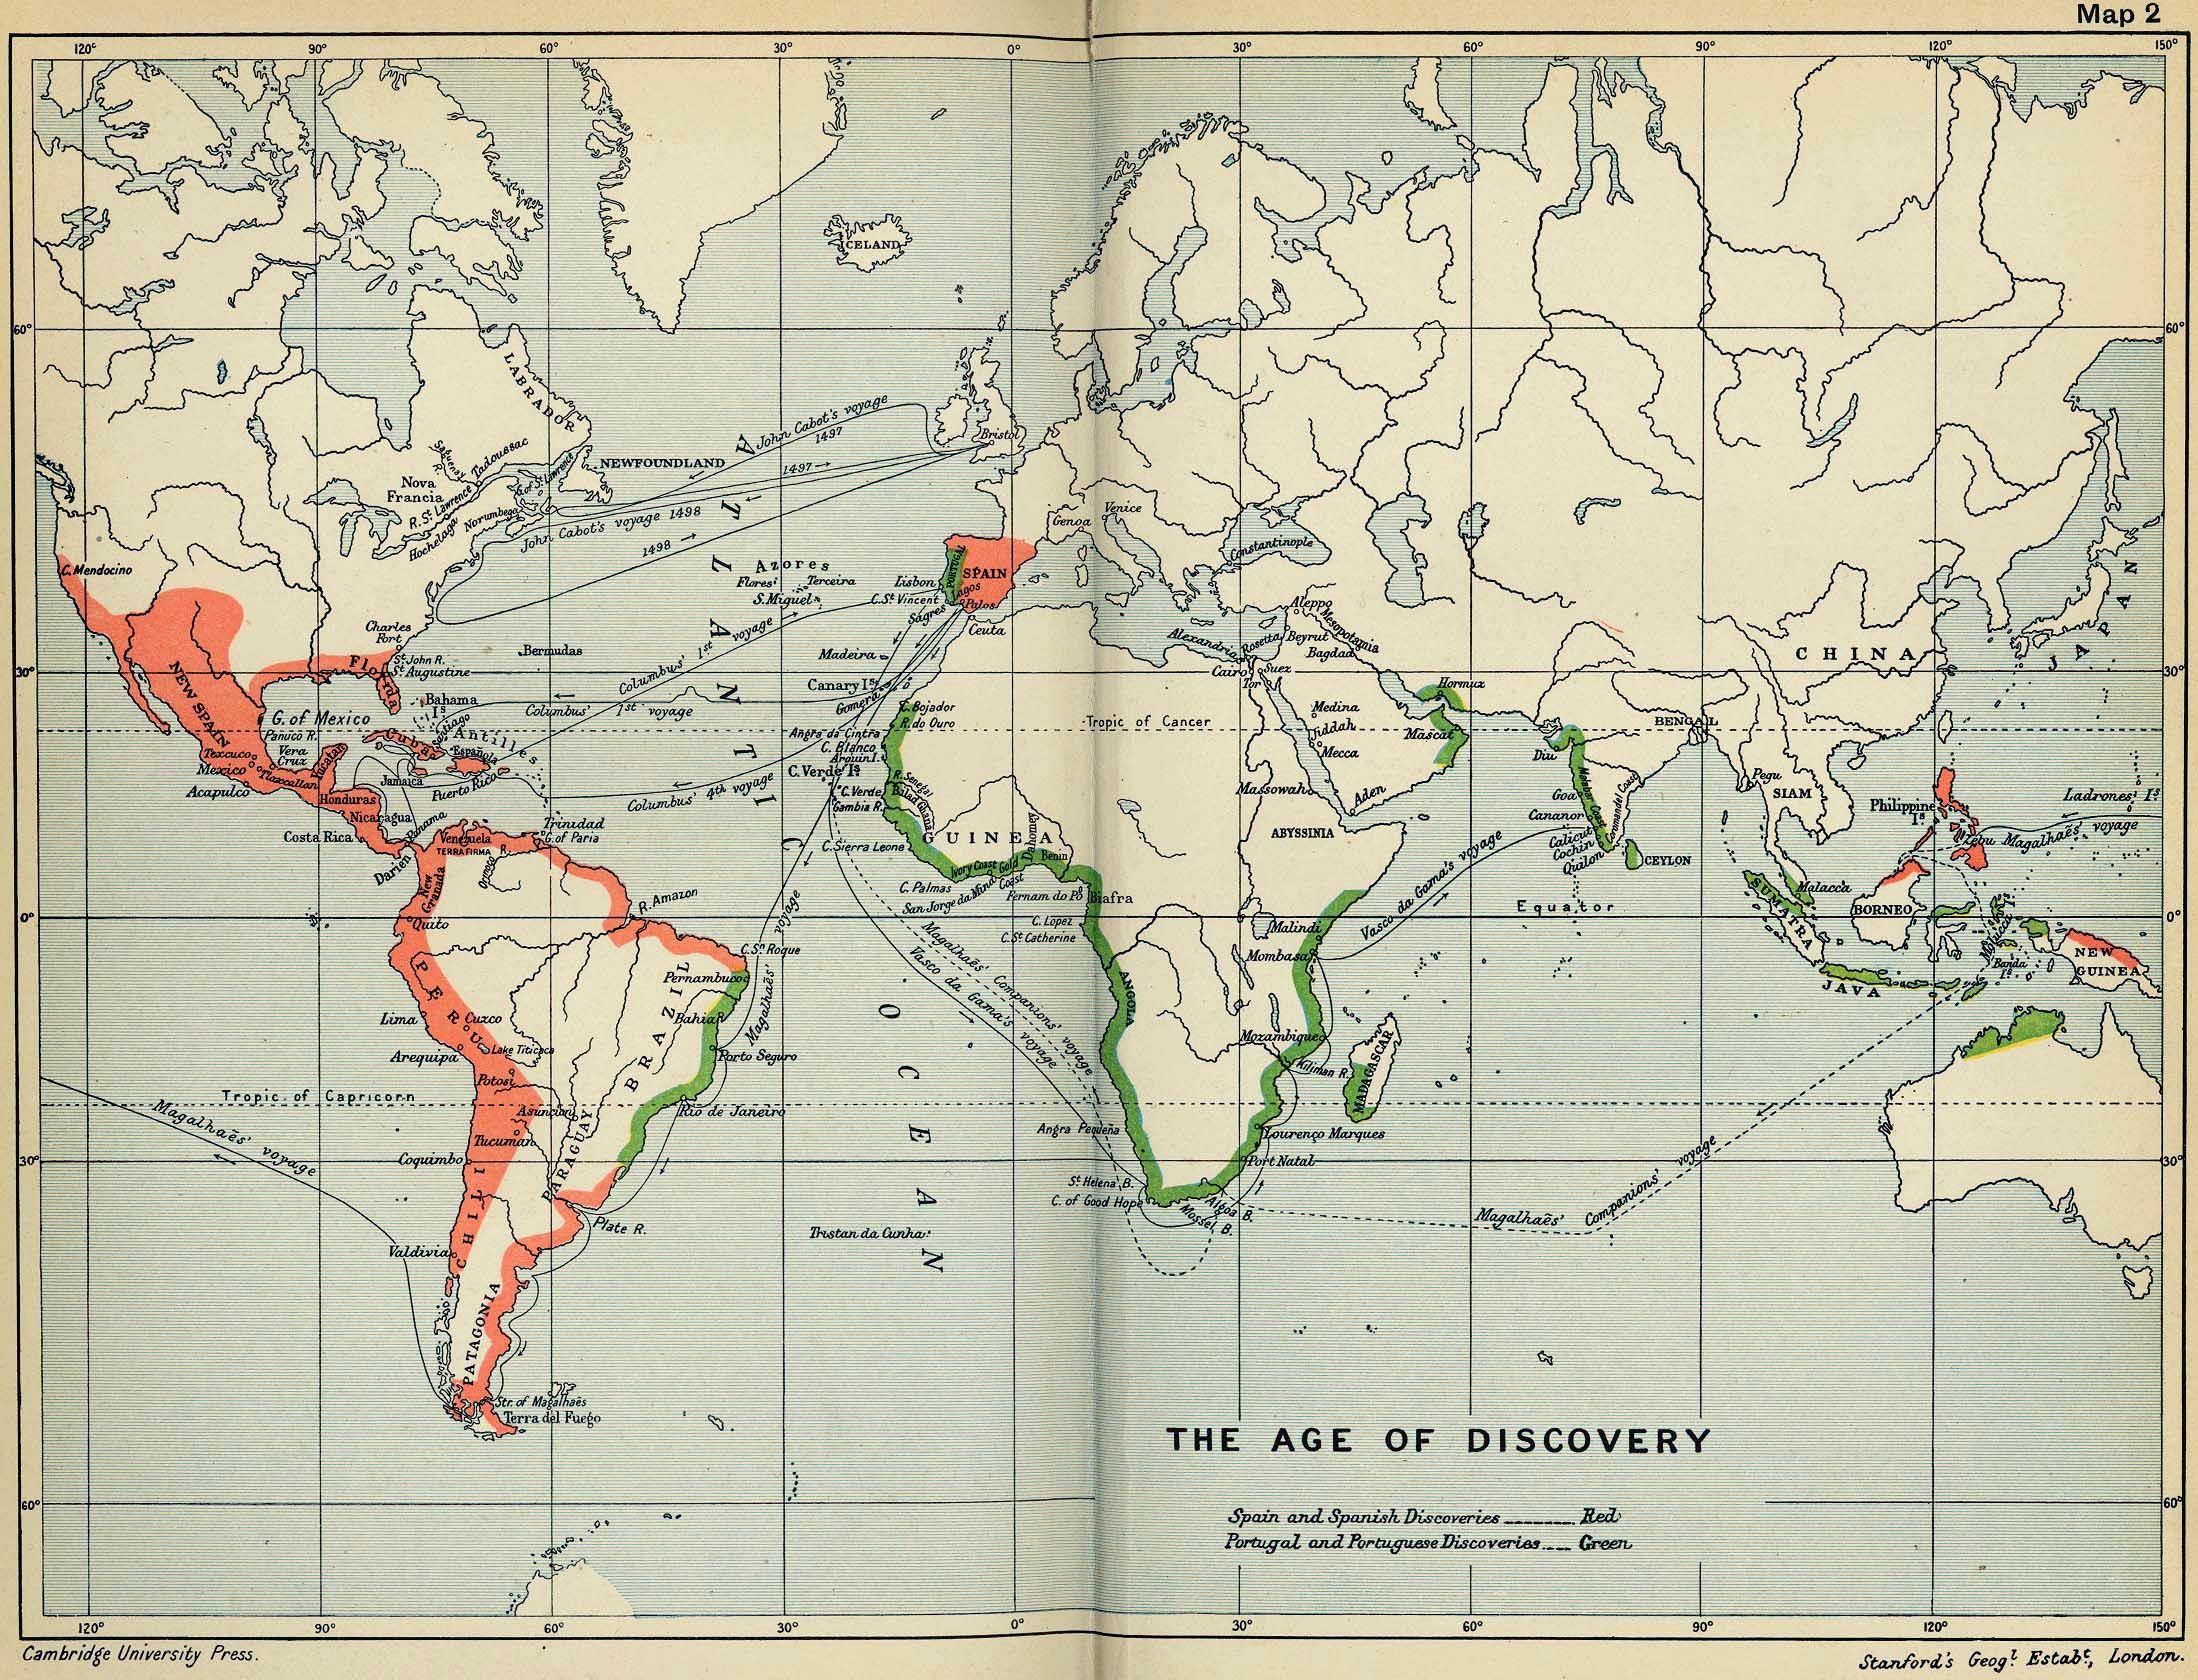 Biba Portugal Caralho